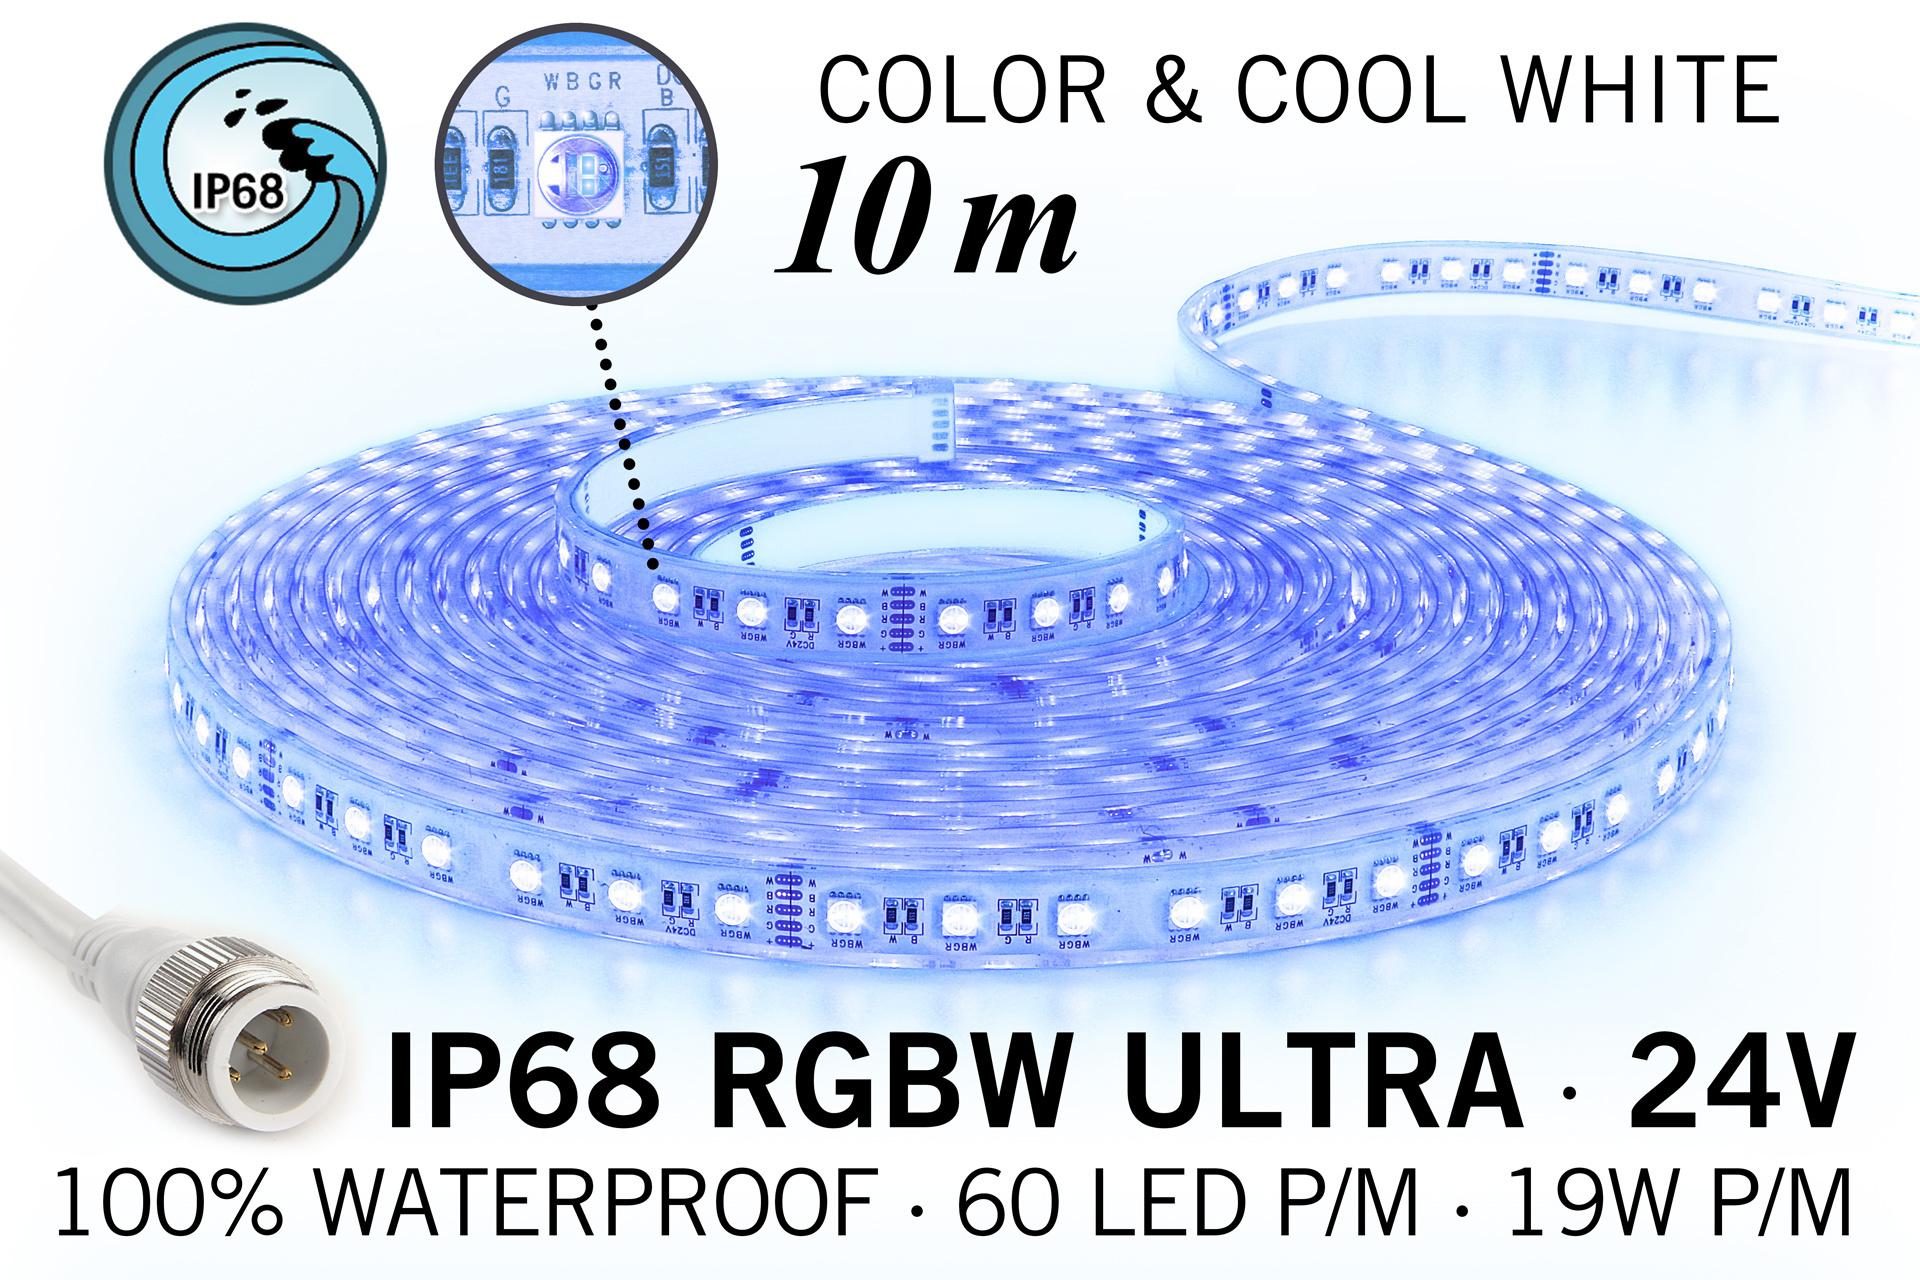 IP68 Waterdichte RGBW ULTRA Ledstrip, RGB+Koel wit, 60 led's p/m, 24 Volt, 10 meter